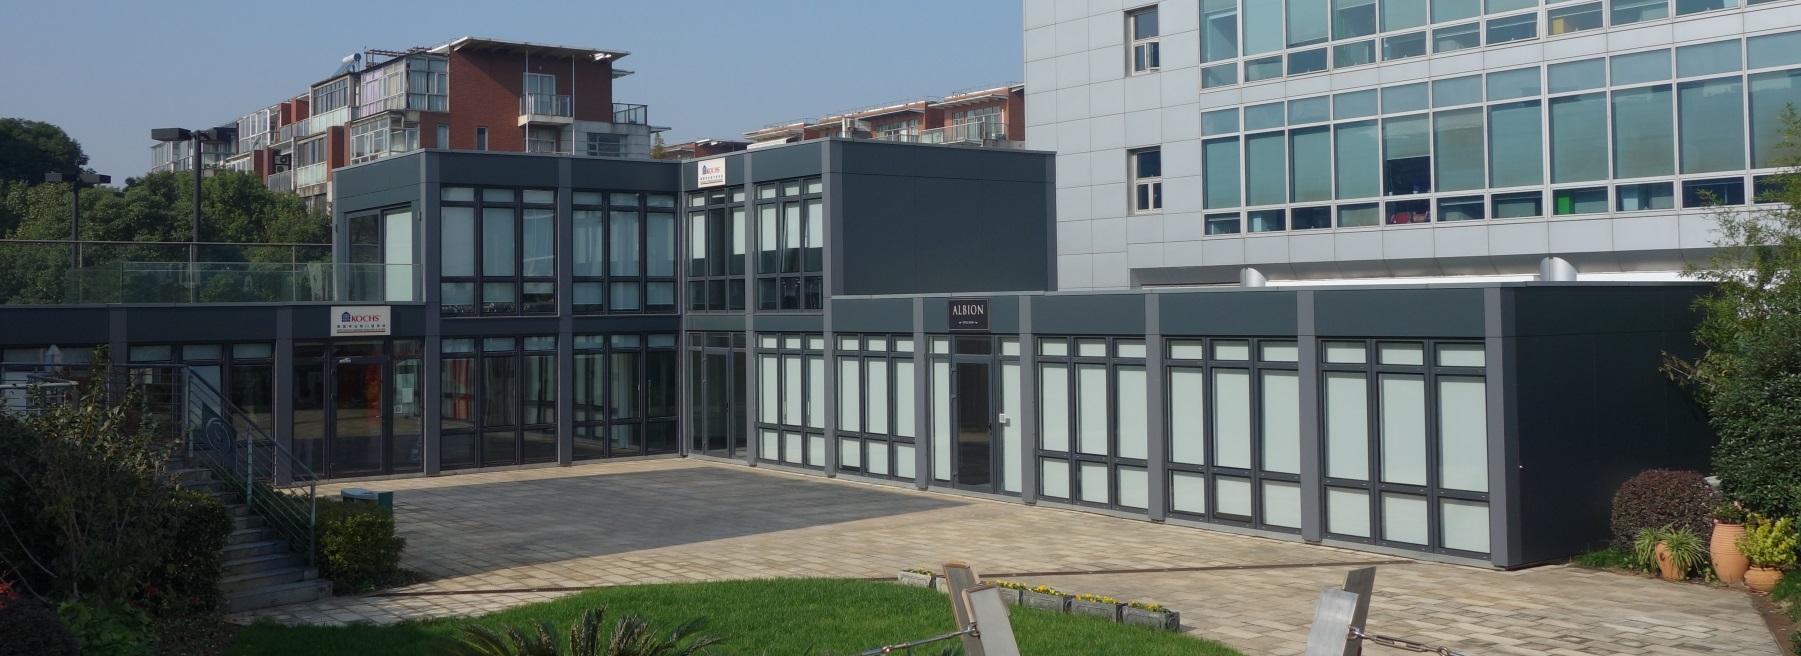 XCUBE modular office